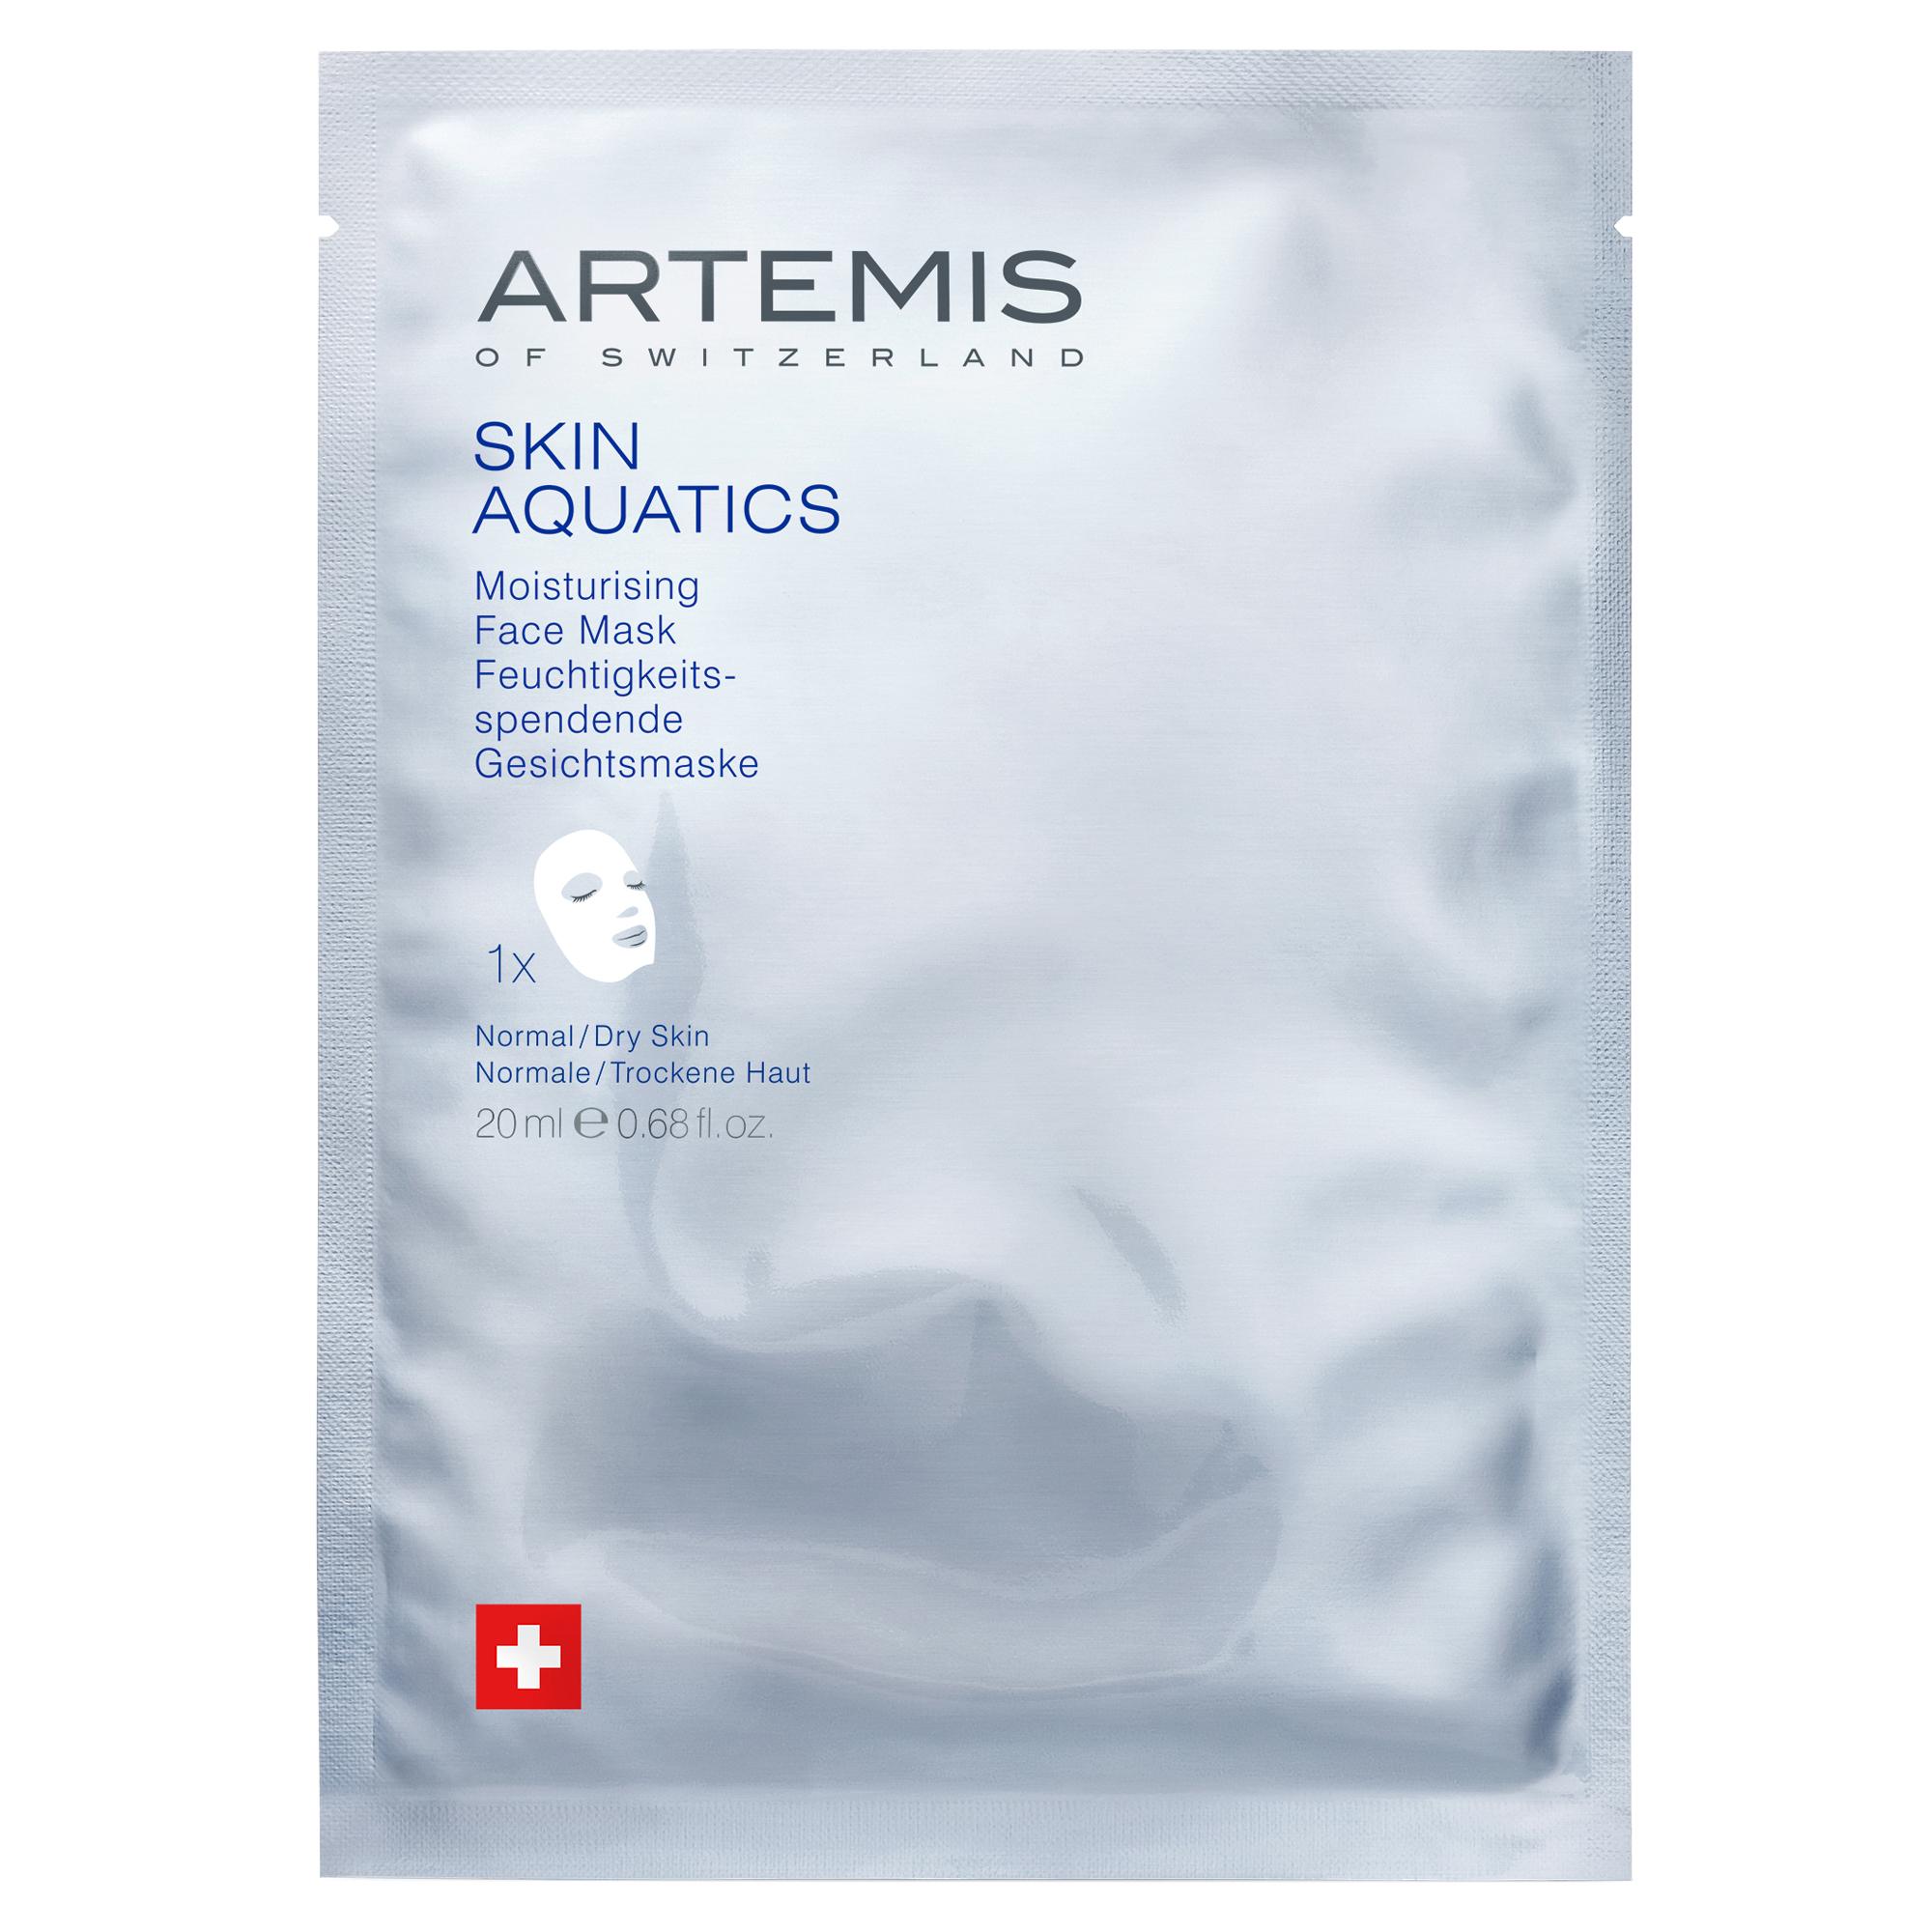 Artemis Skin Aquatics Moisturising Face Mask 20ml